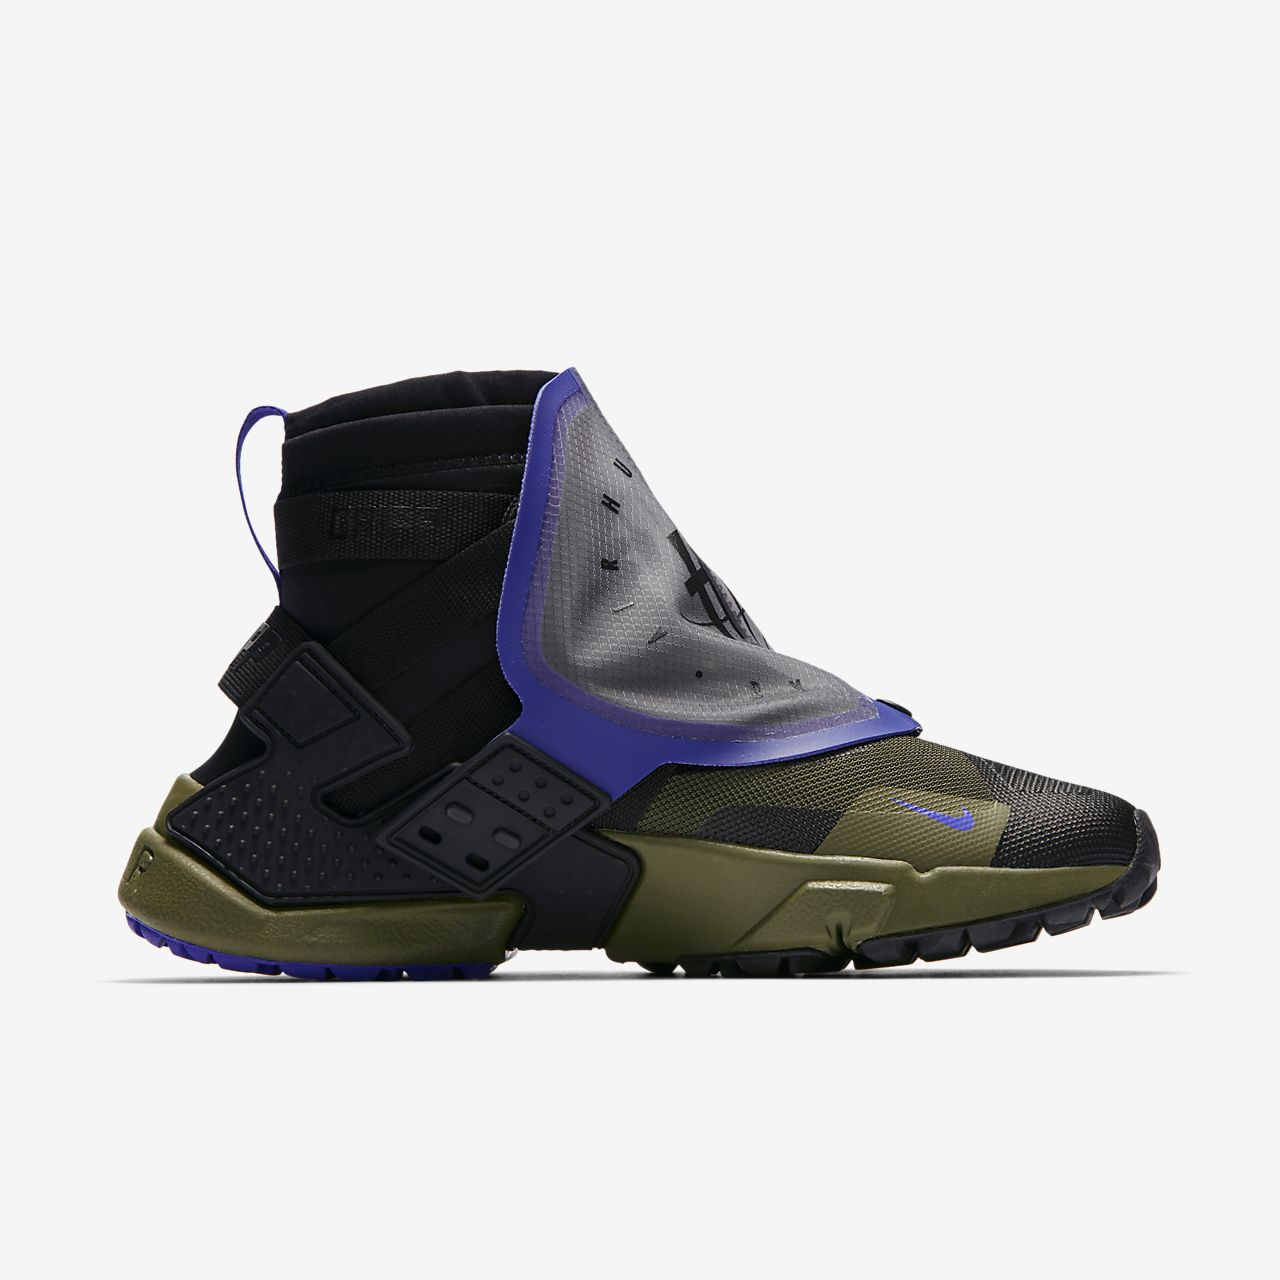 save off 3b0f0 73ffc ... Nike Air Huarache Gripp Men s Shoe